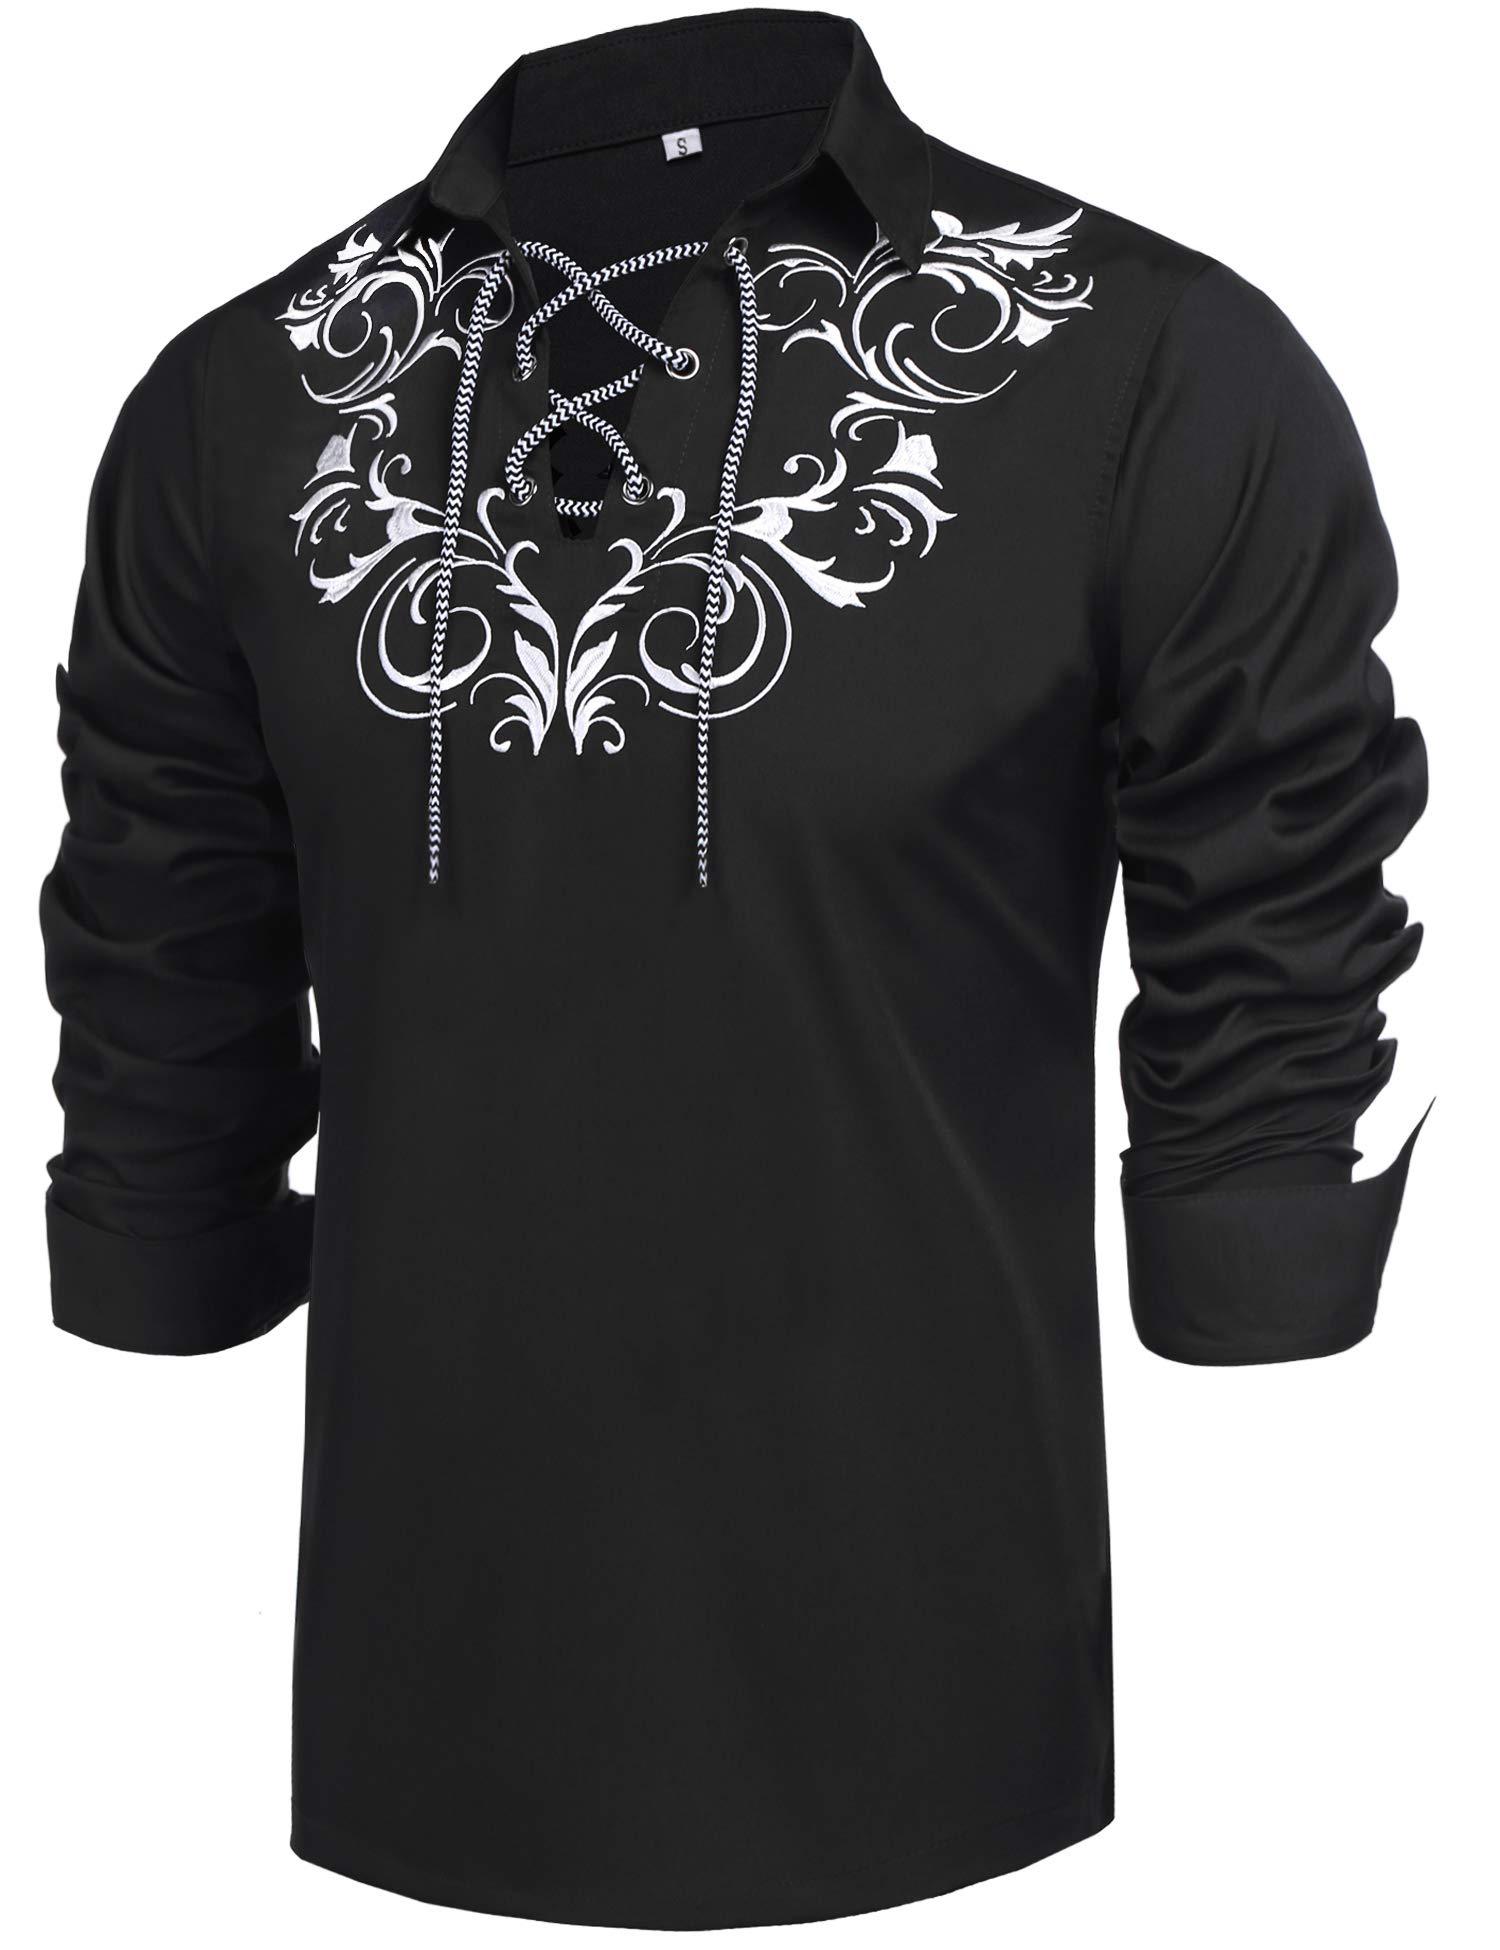 Daupanzees Mens Scottish Jacobite Ghillie Kilt Shirt Casual Long Sleeve Shirt Black